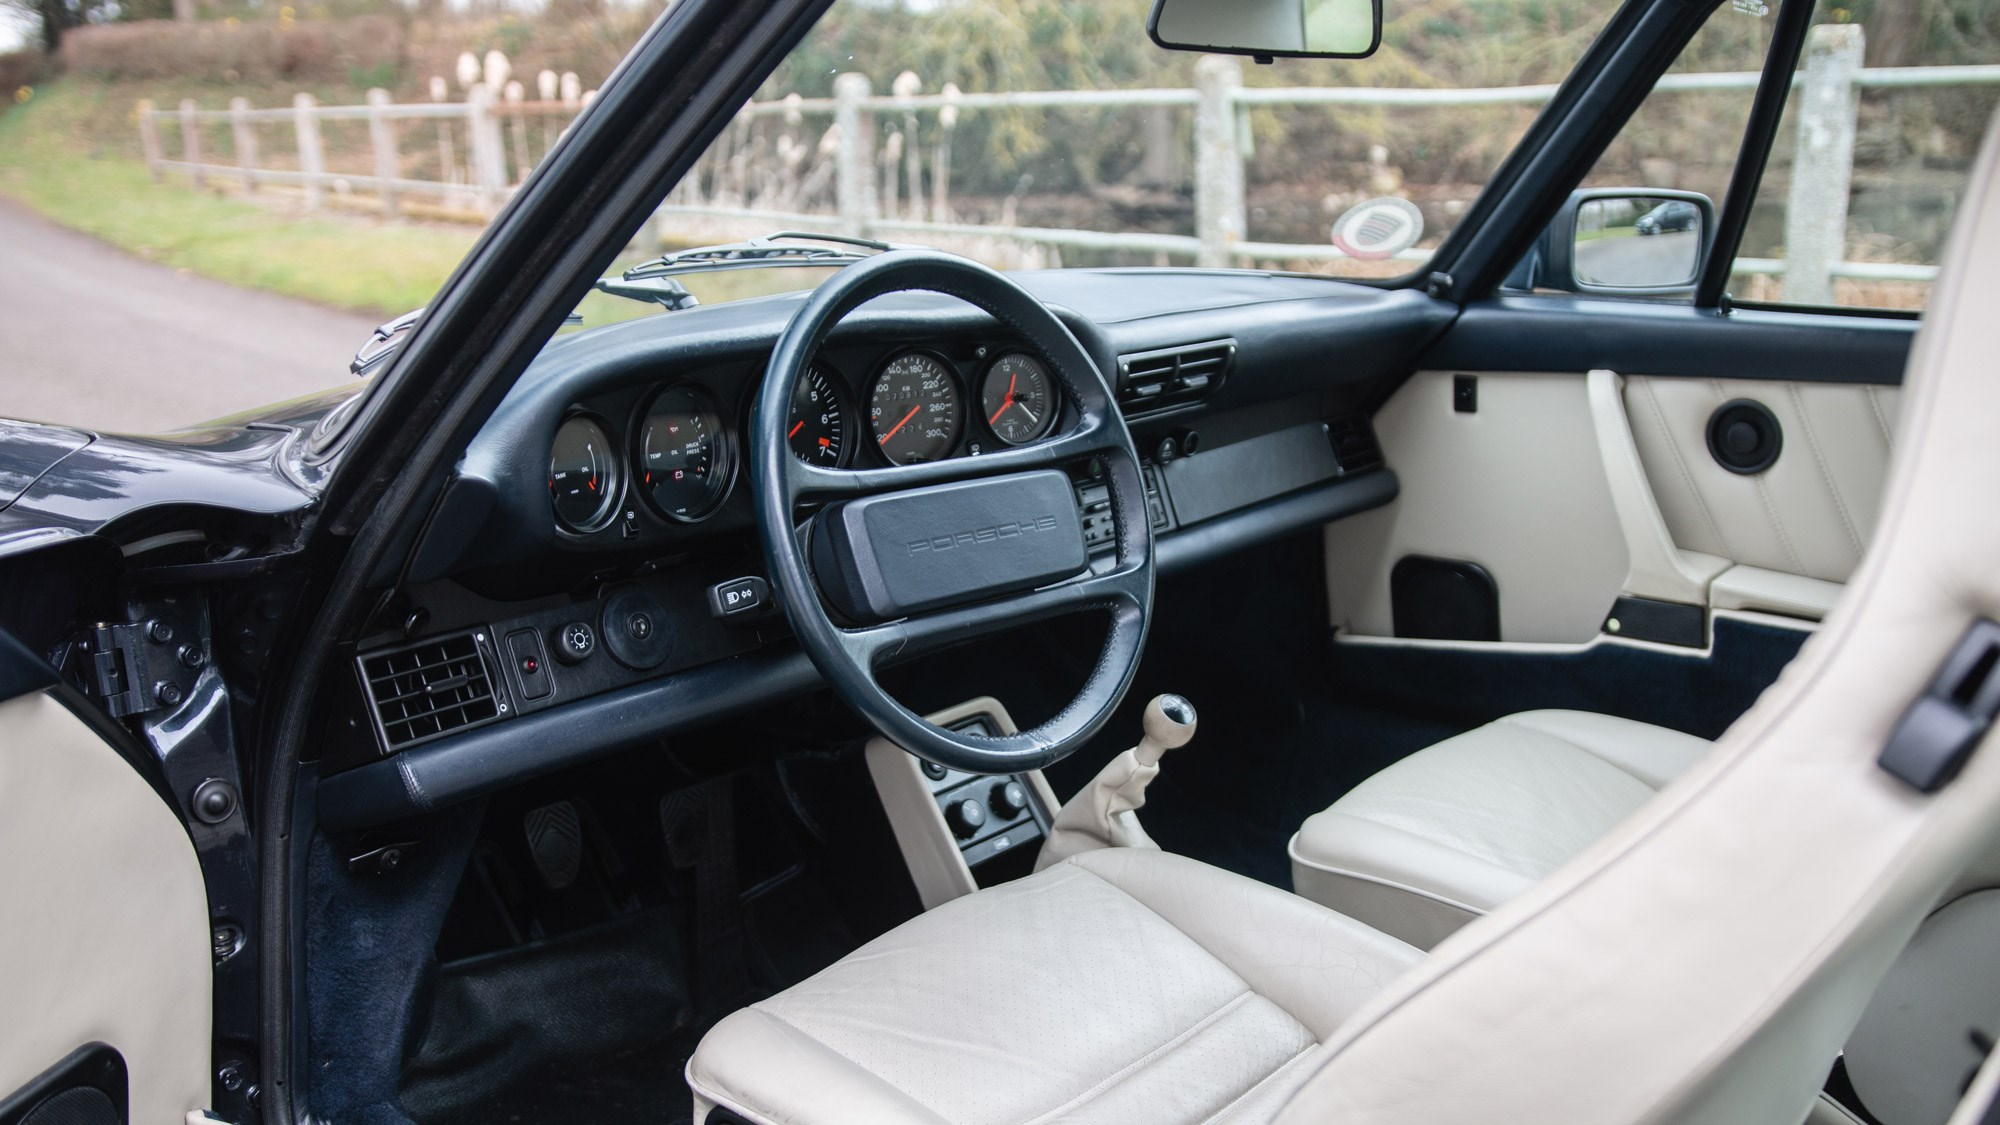 Driving the classics: Porsche 930 Turbo (1987) review | CAR Magazine